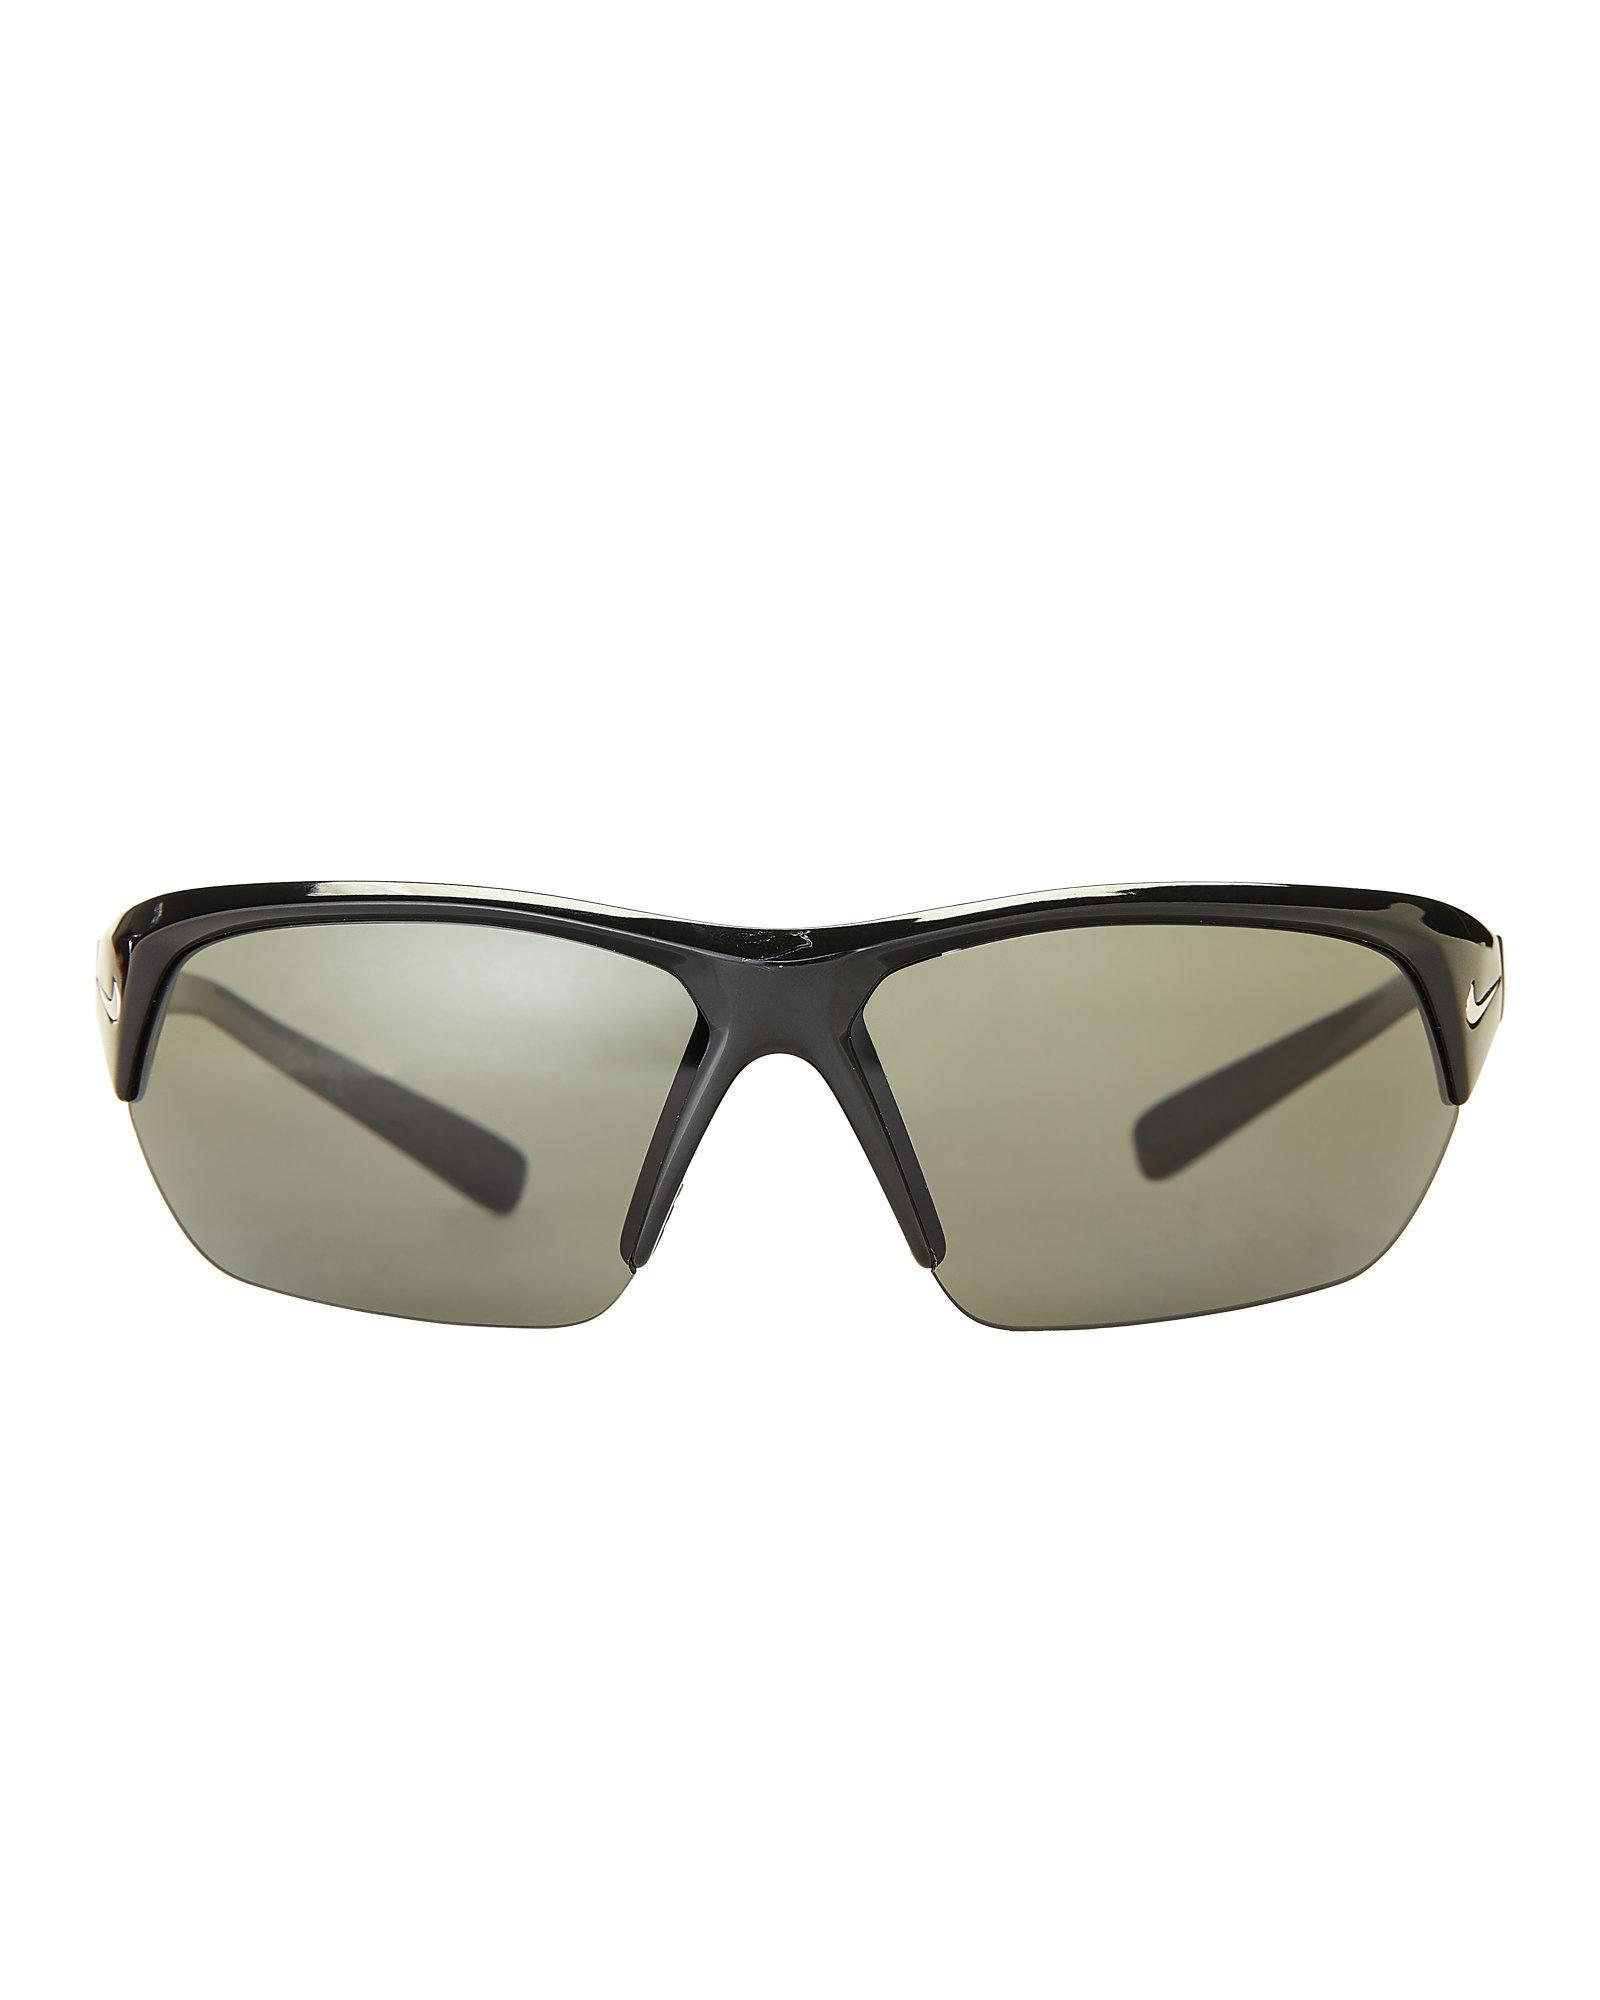 20159481dba Lyst - Nike Ev1127 Black Skylon Ace P Polarized Wrap Sunglasses in Black  for Men